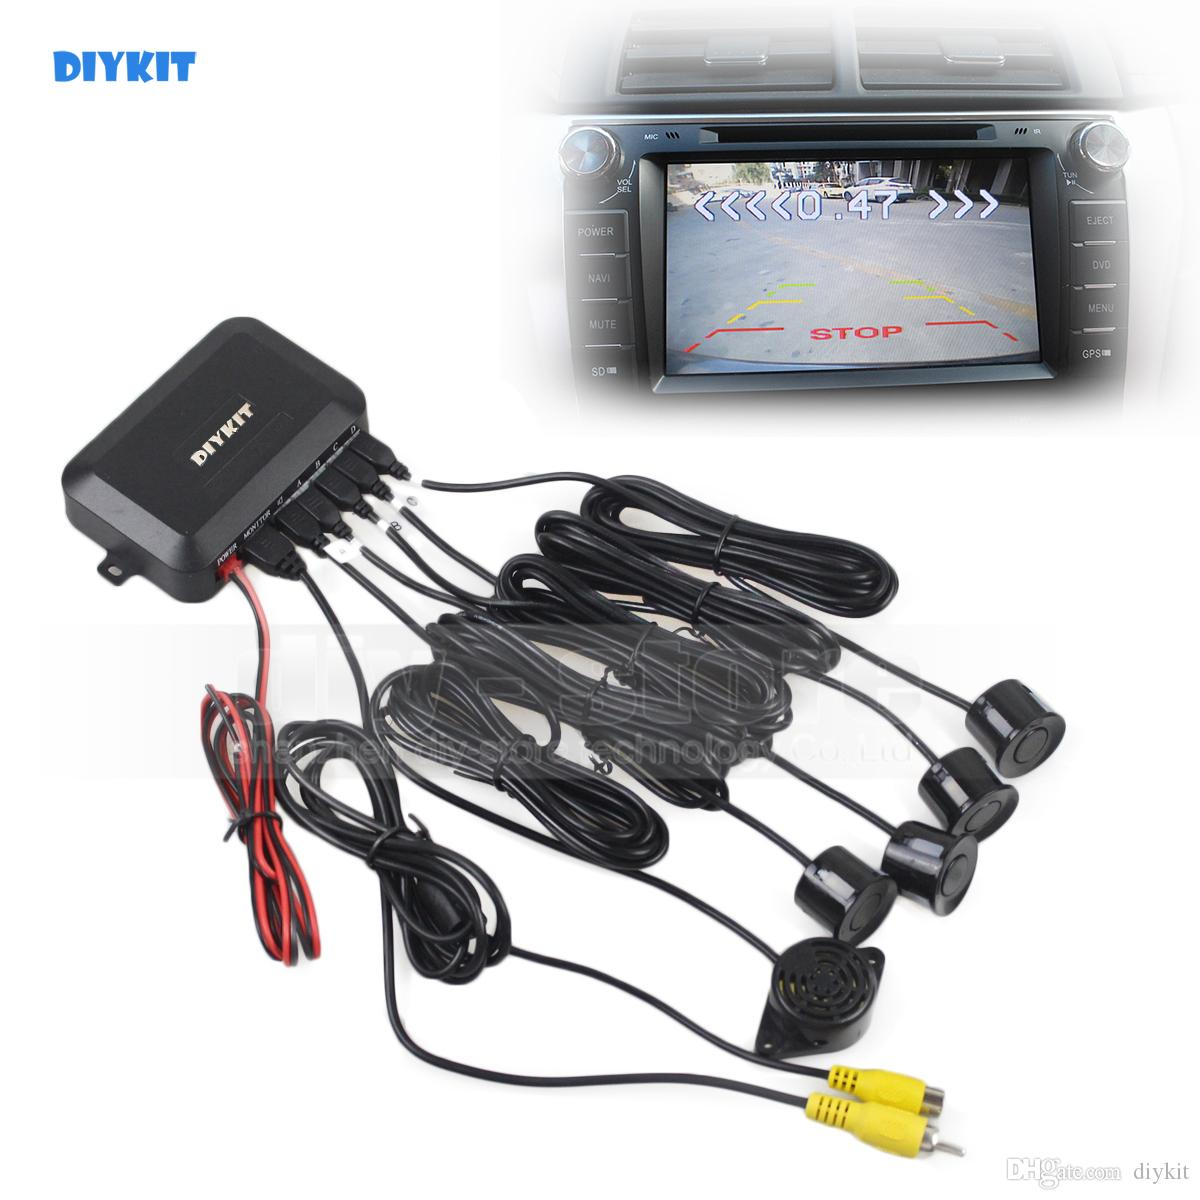 DIYKIT Video Parking Radar Parking Sensor Rear View Backup Security System Kit Sound Buzzer Alert Alarm for Car Camera Car Monitor